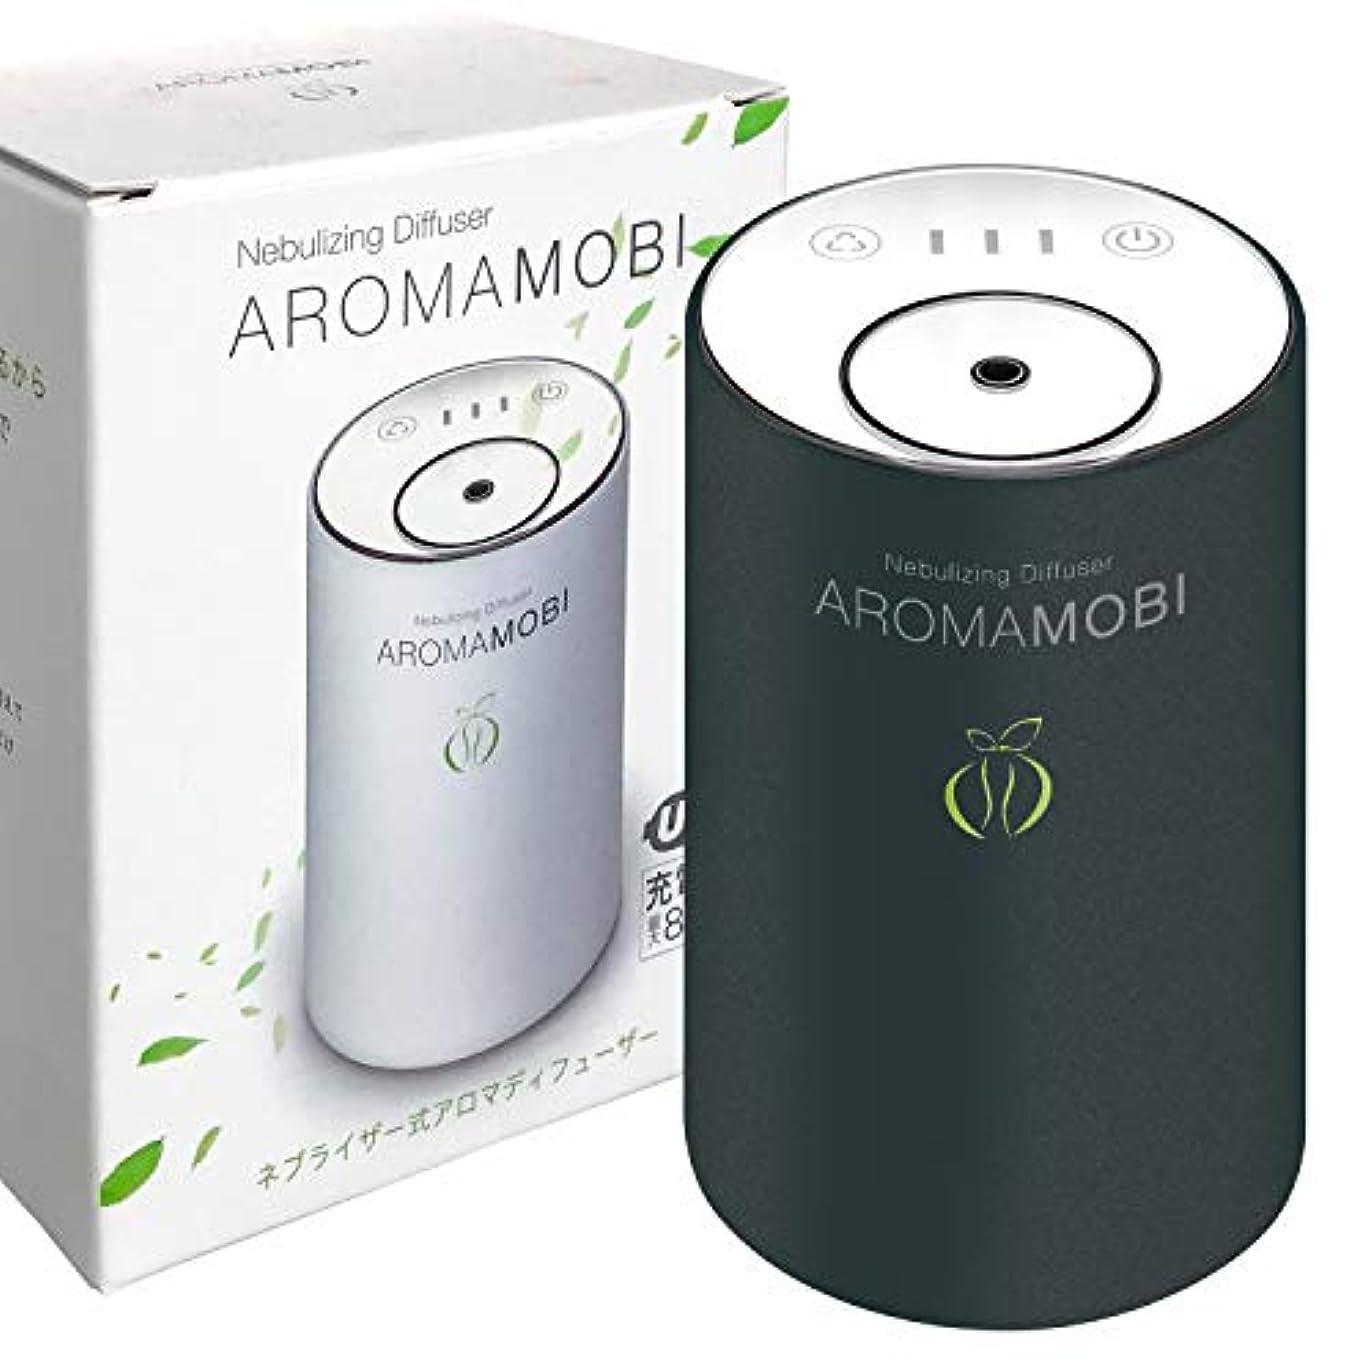 funks AROMA MOBI 充電式 アロマディフューザー ネブライザー式 ブラック